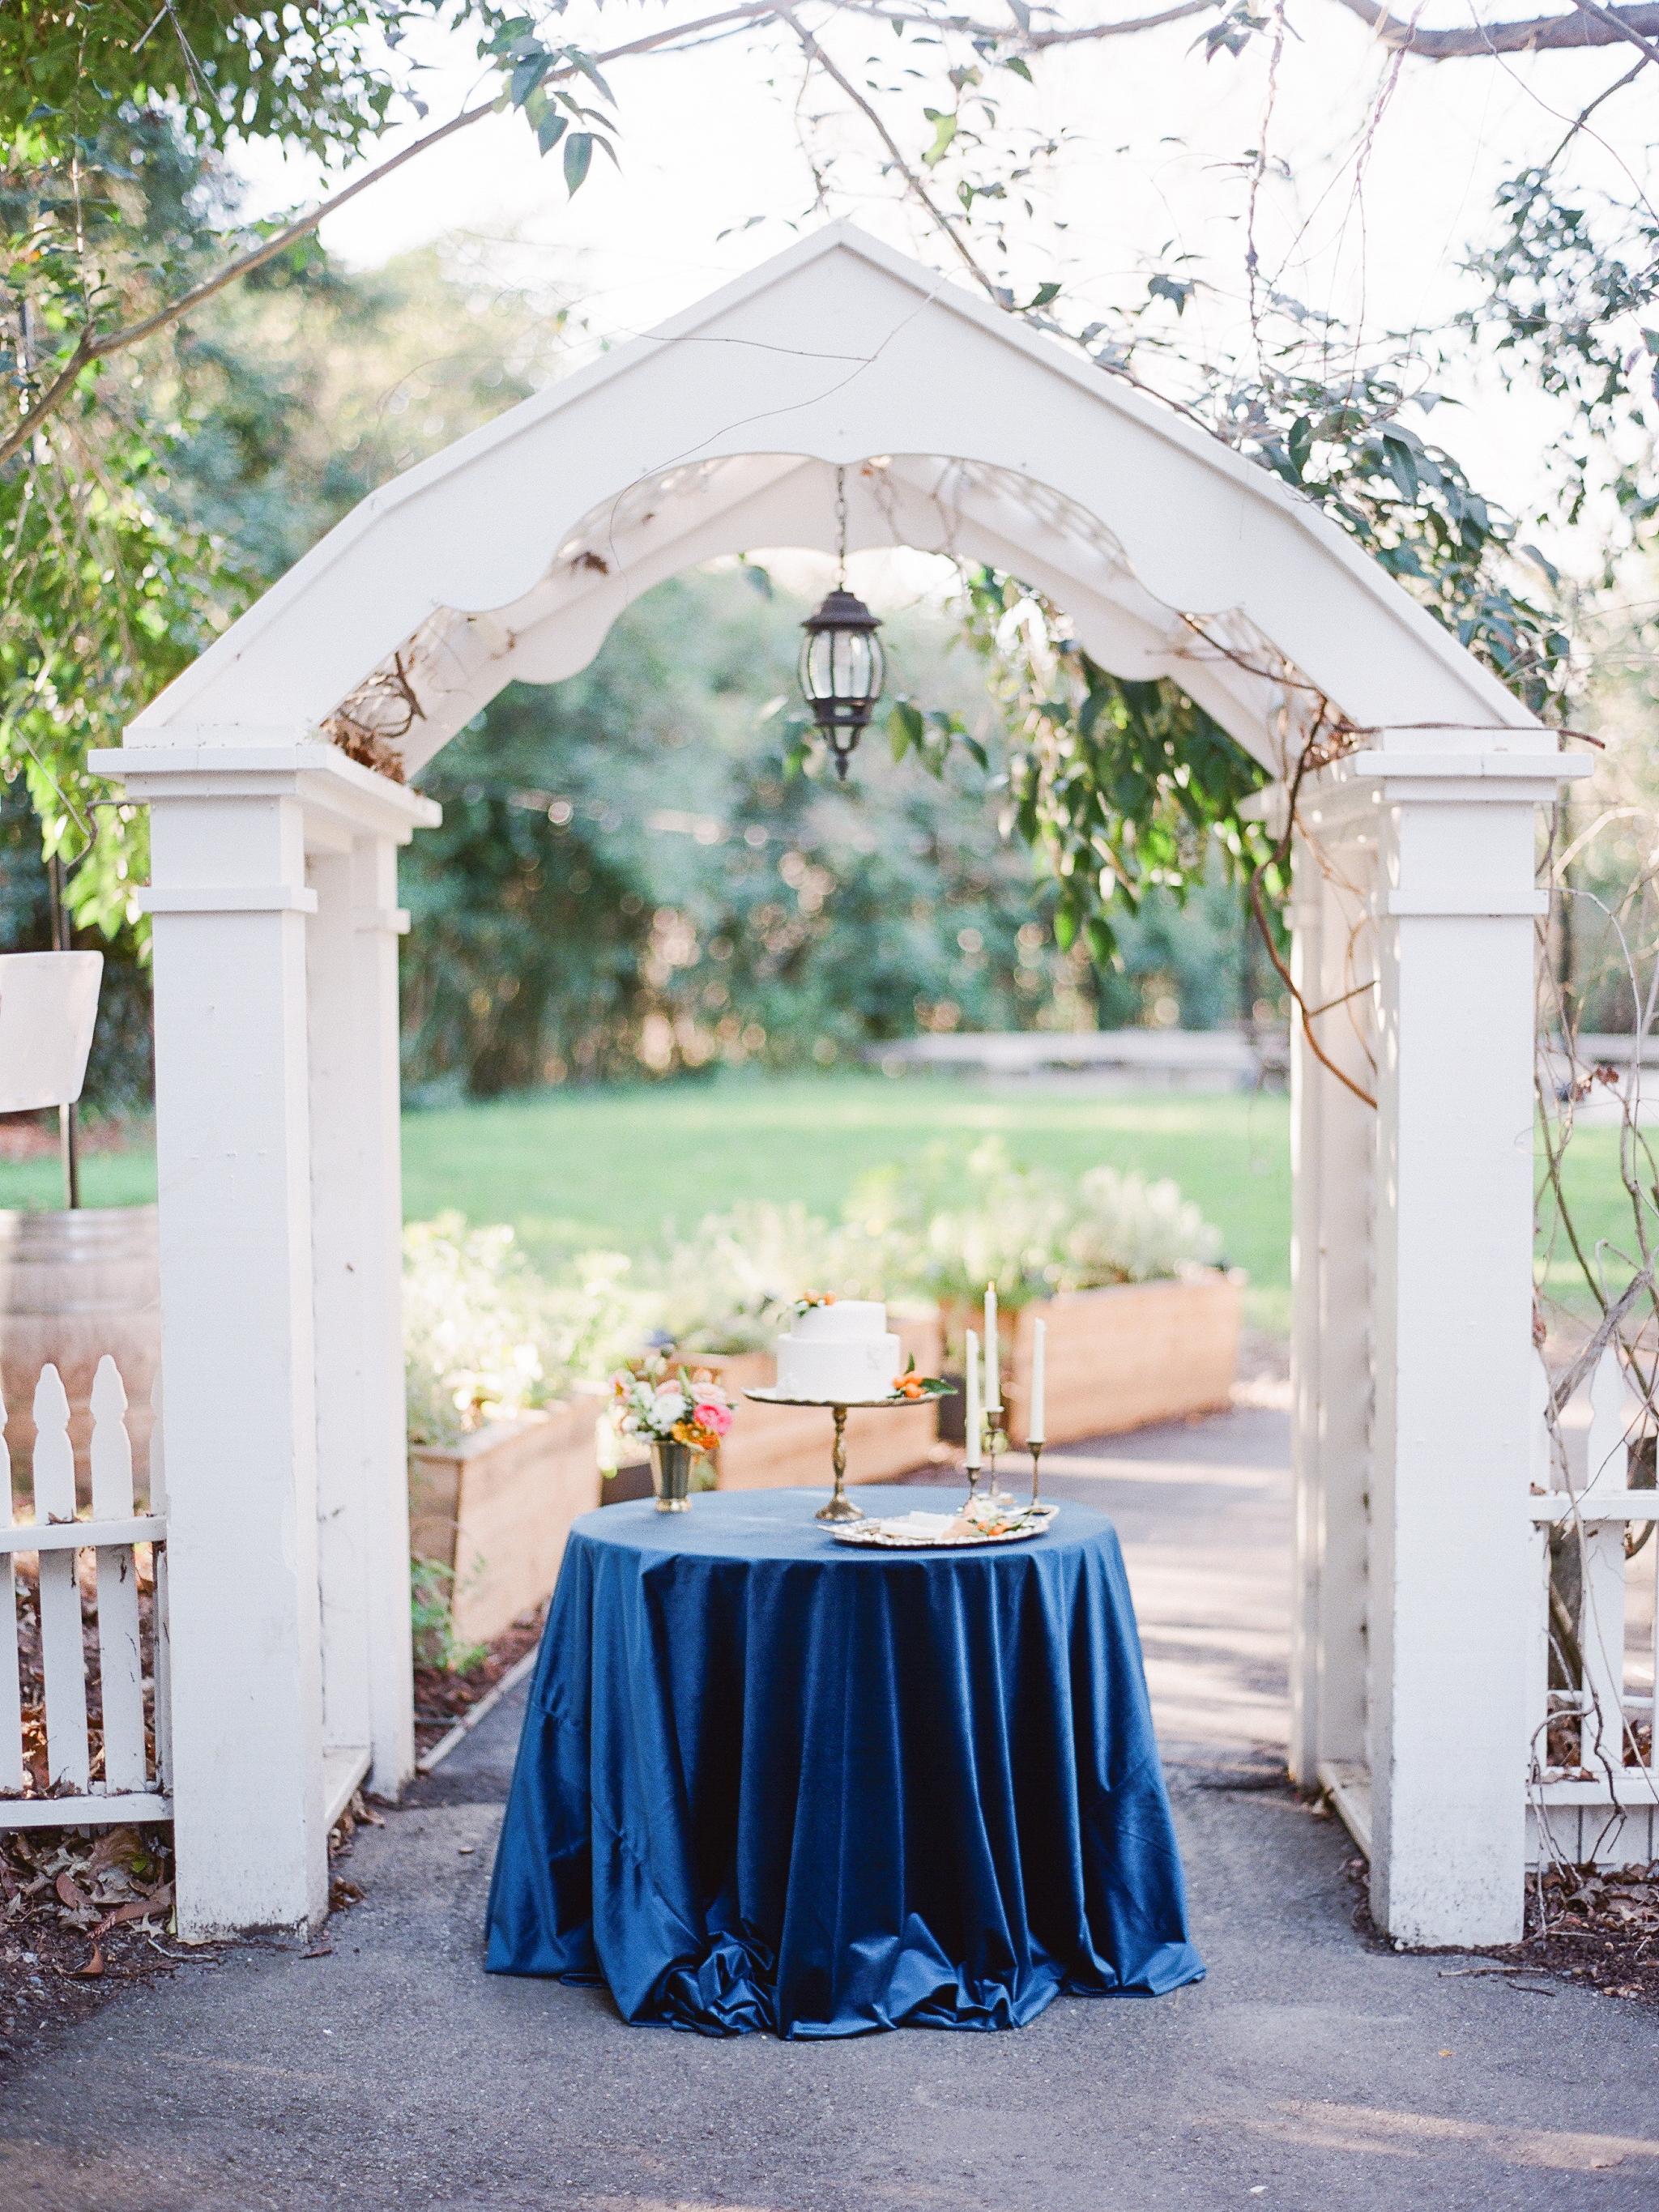 radostinaboseva-garden-wedding-197.jpg